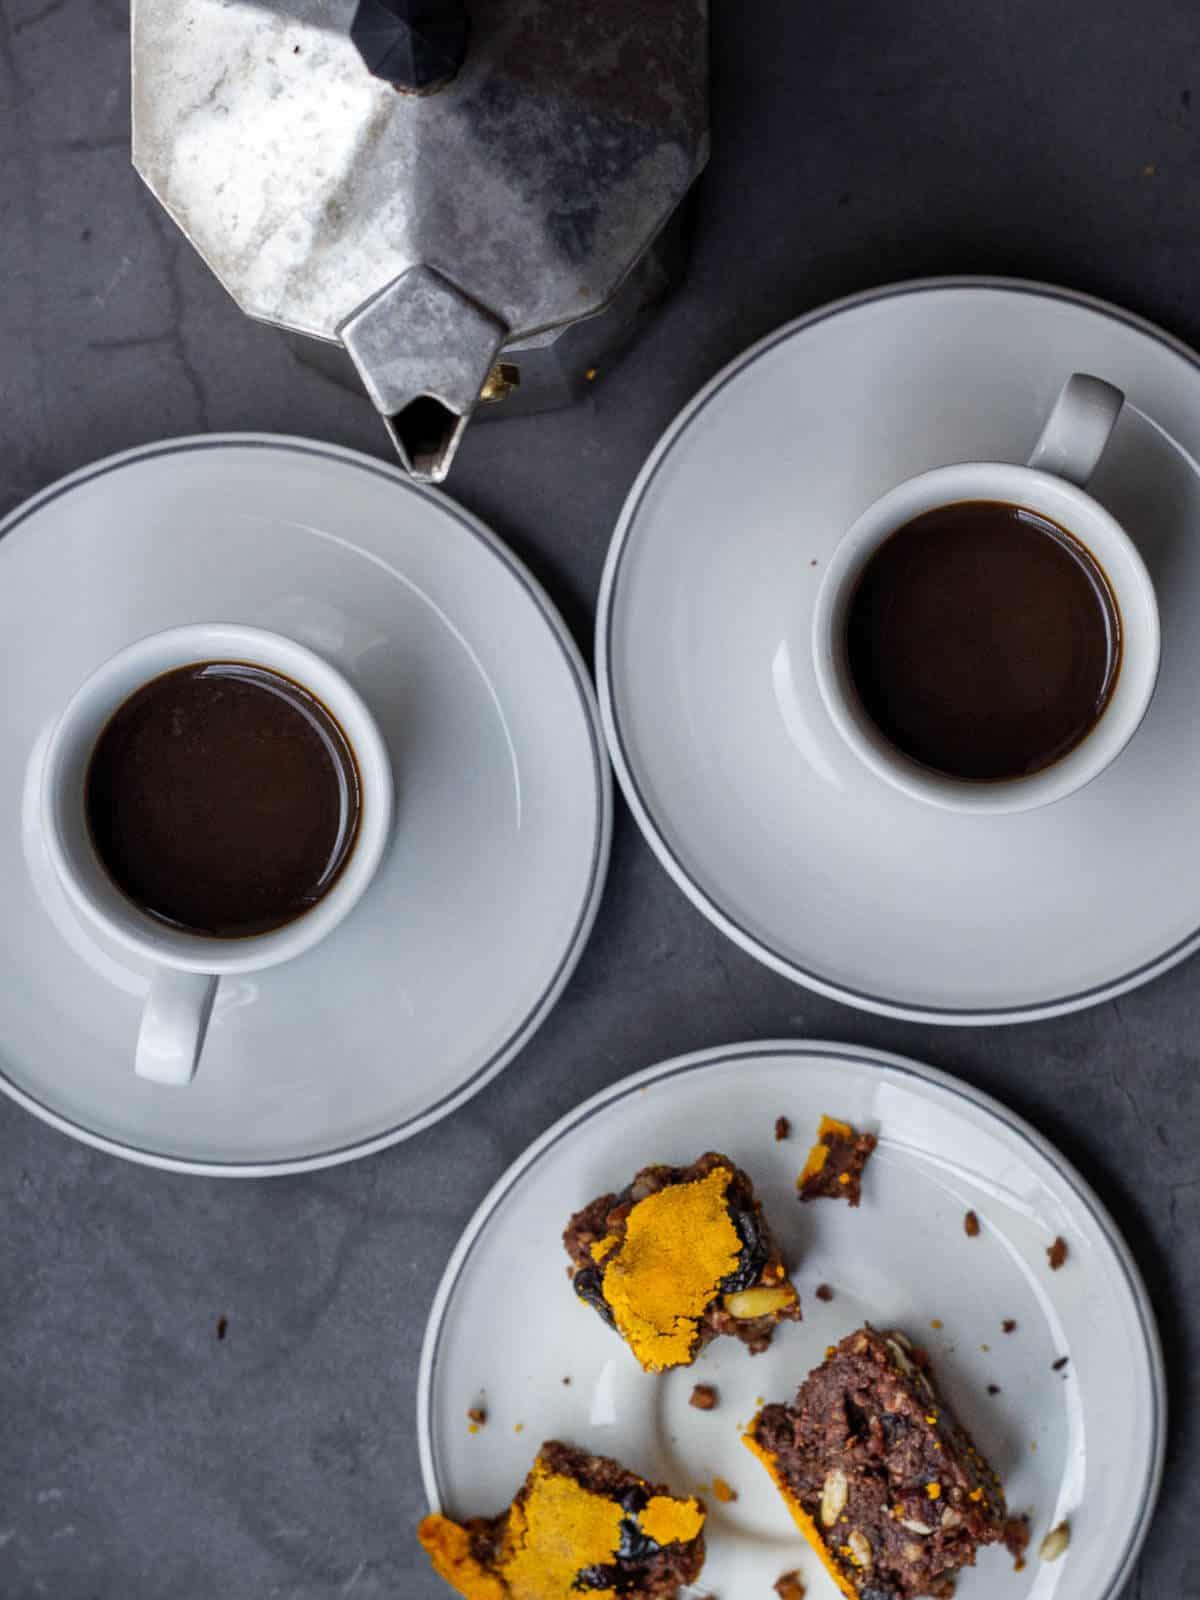 pangiallo romano and coffee